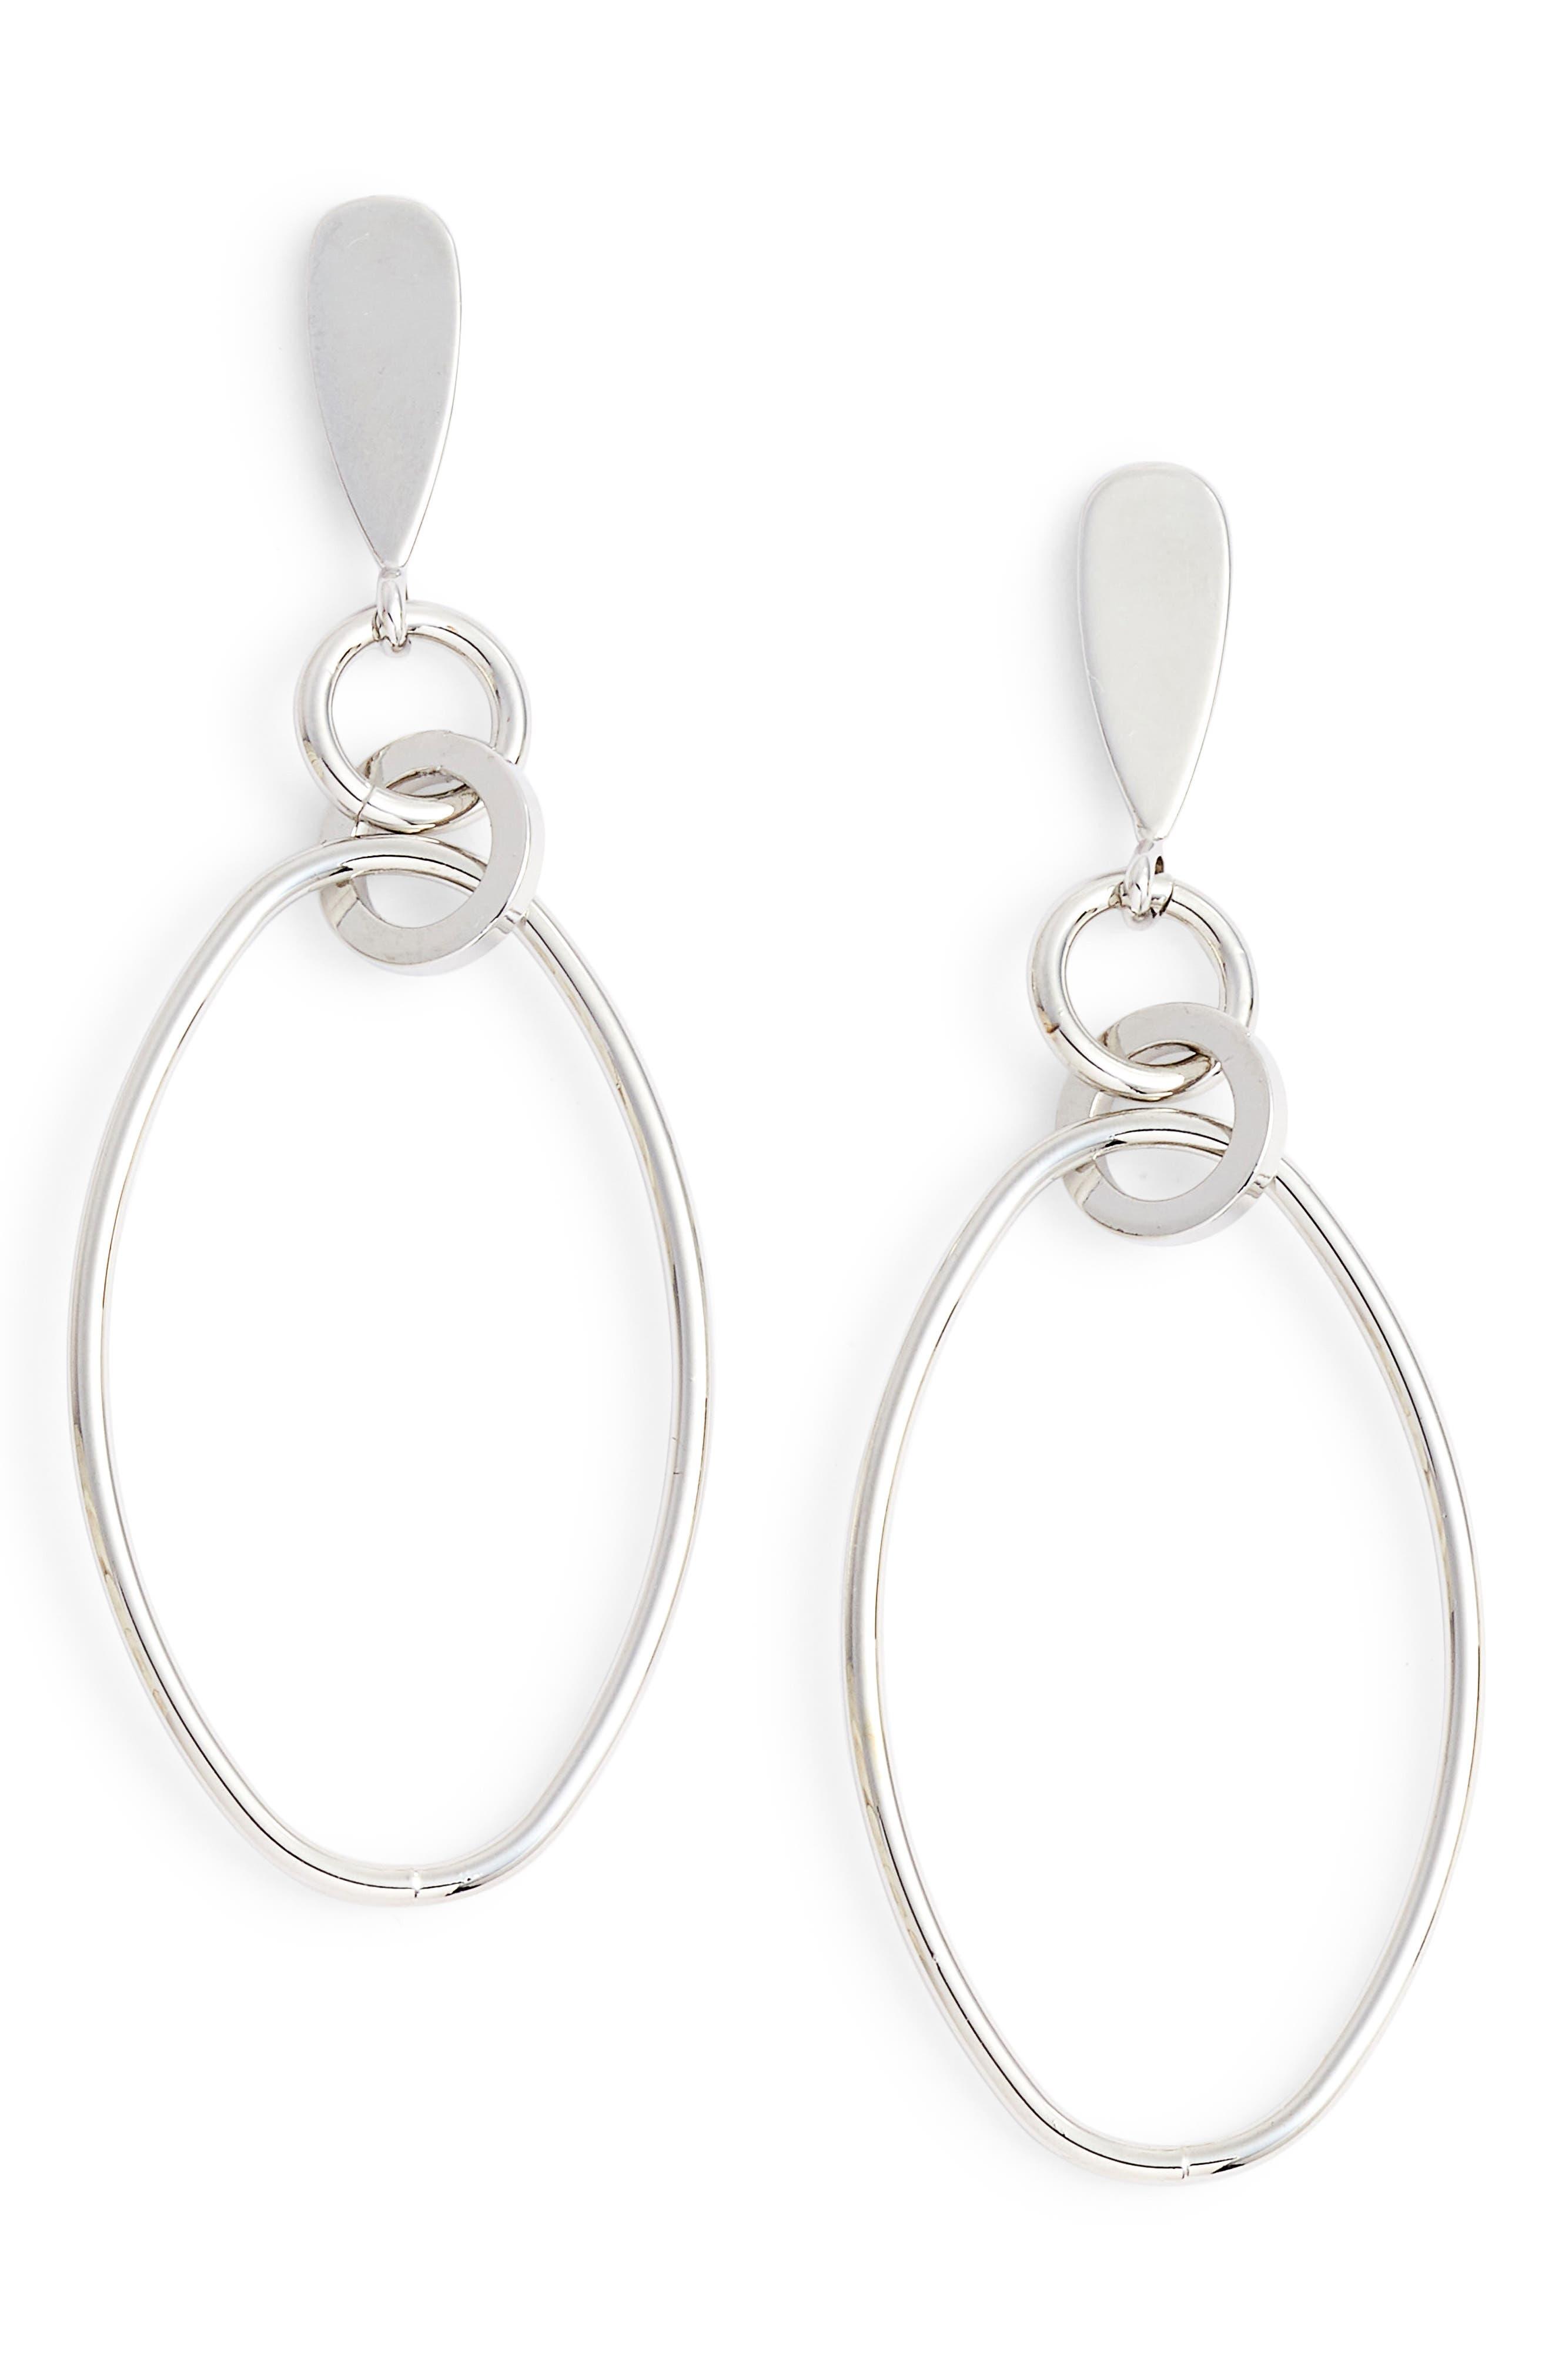 Oval Orbit Front Hoop Earrings,                             Main thumbnail 1, color,                             040